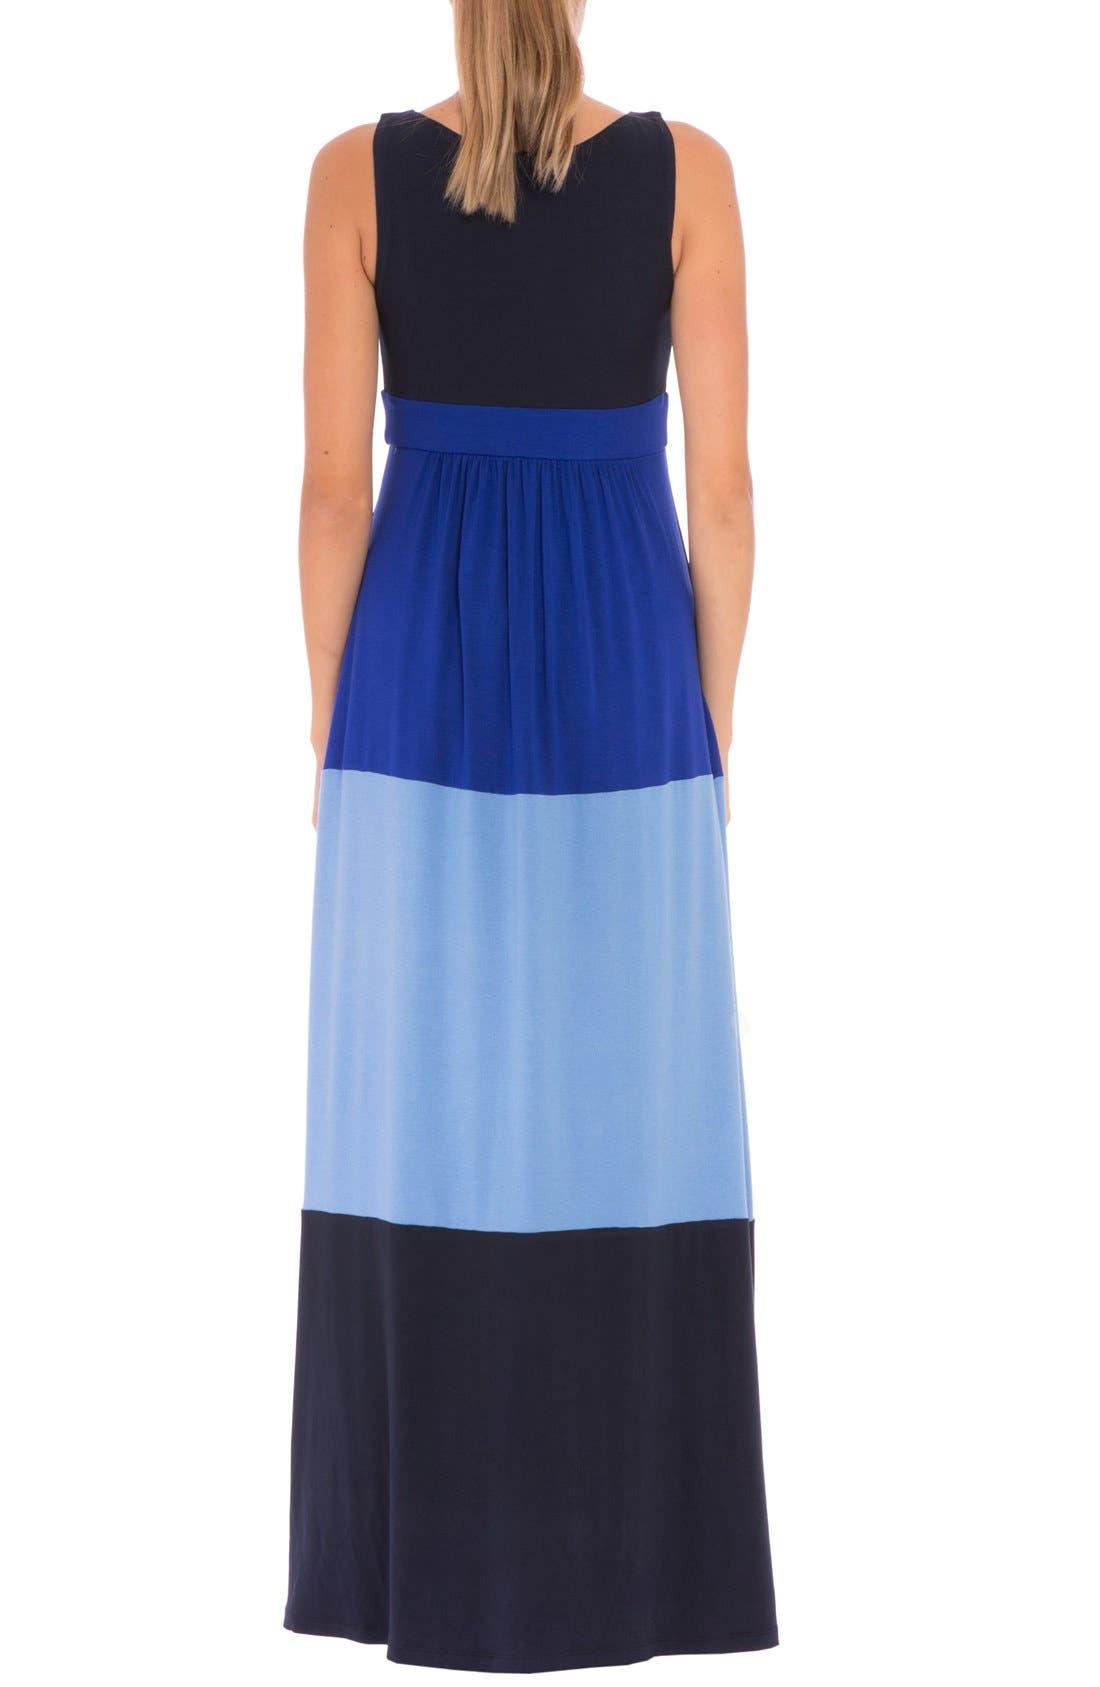 'Margarette' Colorblock Maternity Tank Dress,                             Alternate thumbnail 2, color,                             415